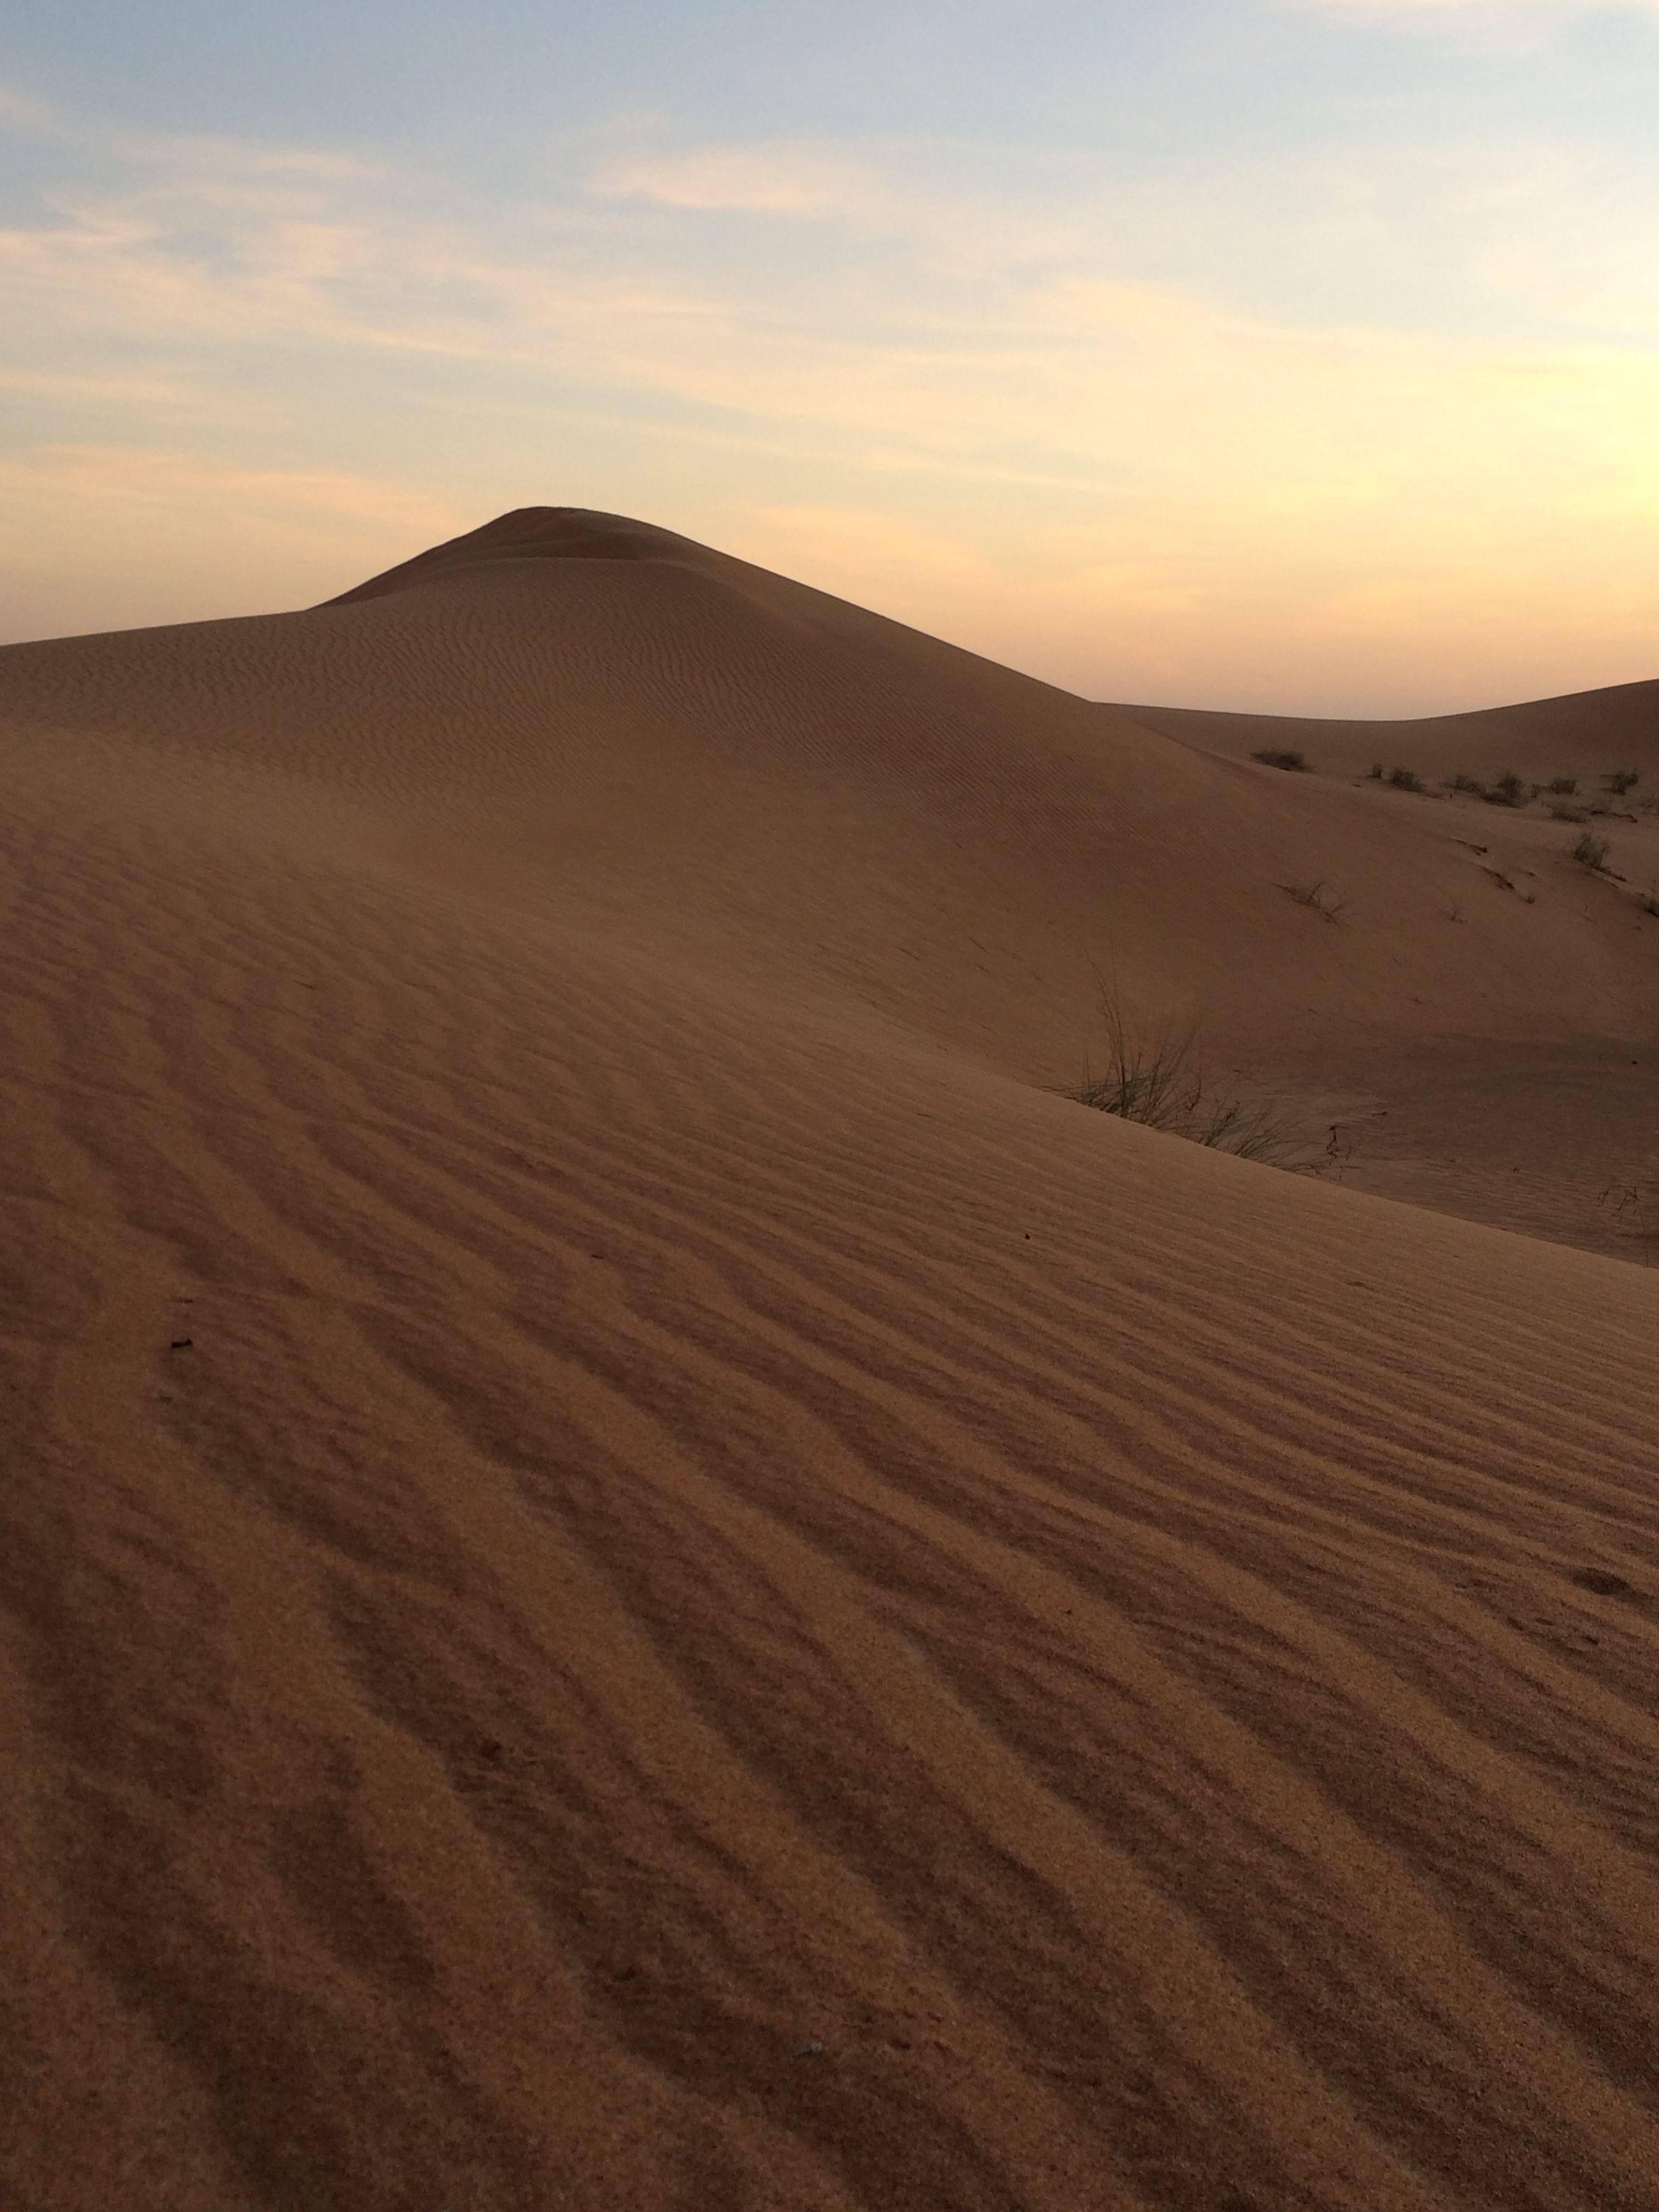 Dubai #desert #dubai #emirates